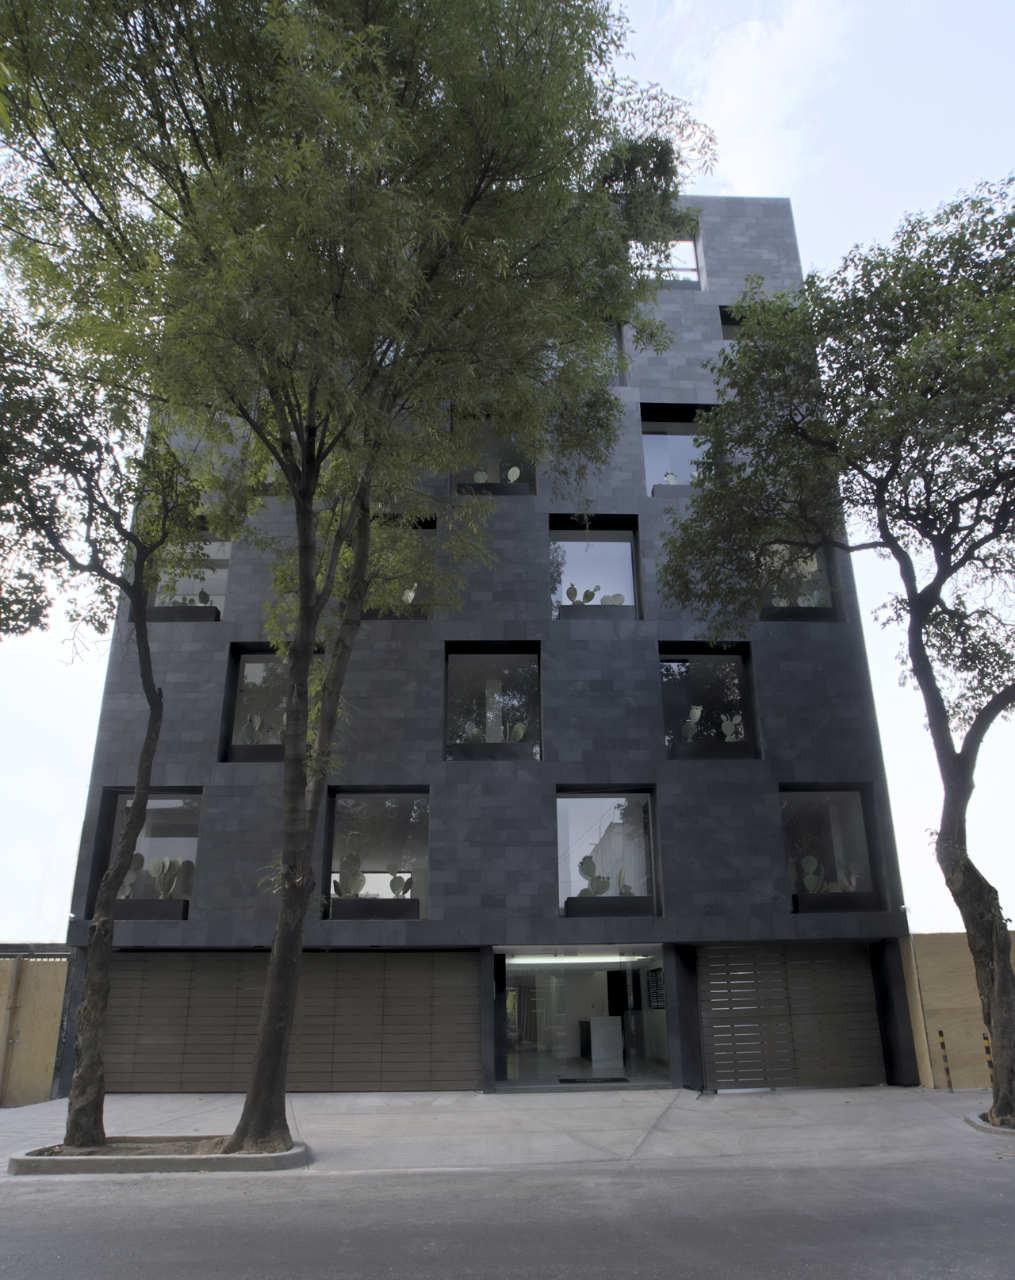 Recycled Building / Alonso de Garay Architects, © Jimena Carranza